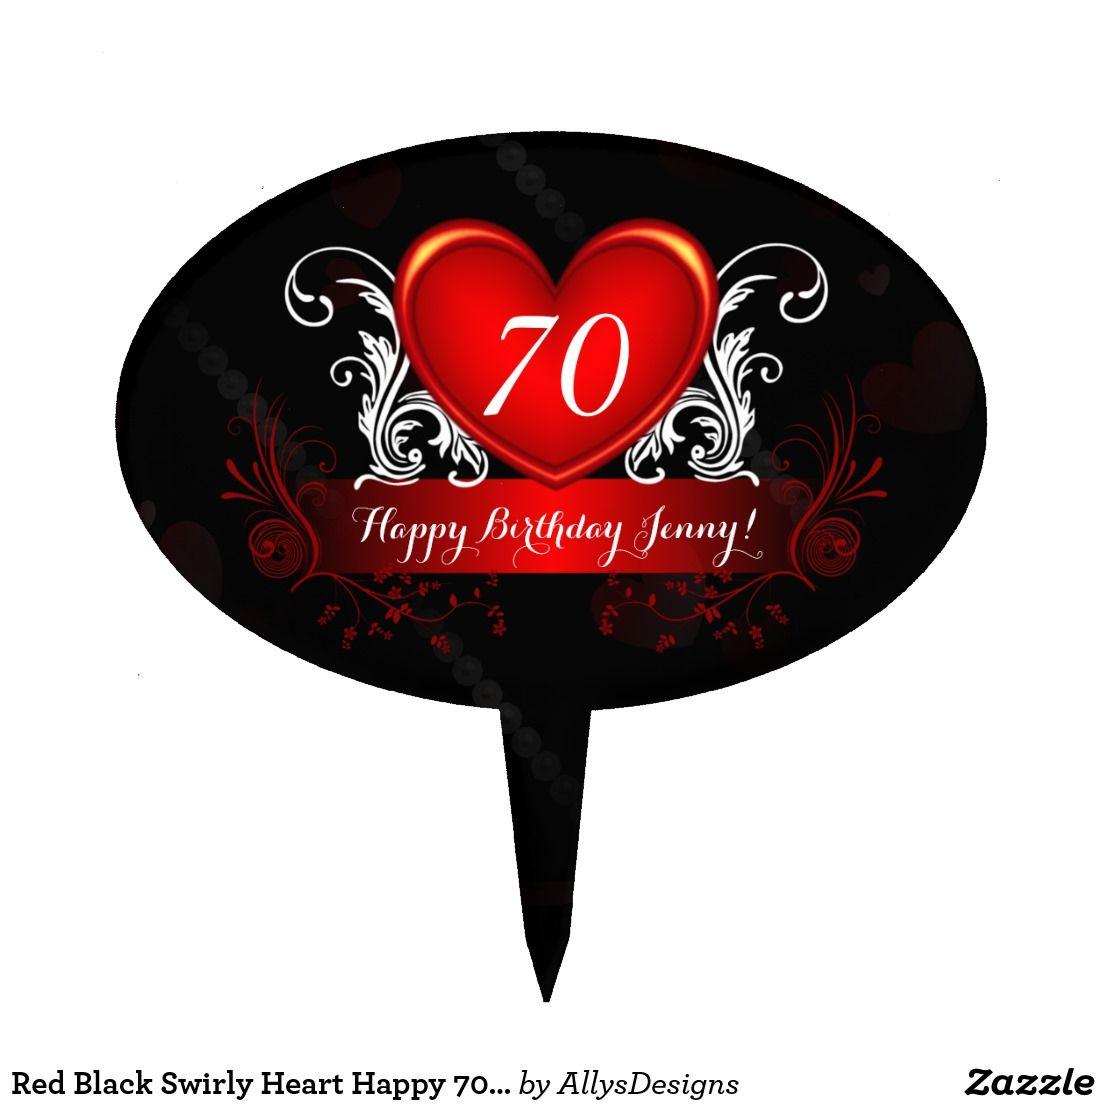 Red Black Swirly Heart Happy 70th Birthday Cake Topper 70th